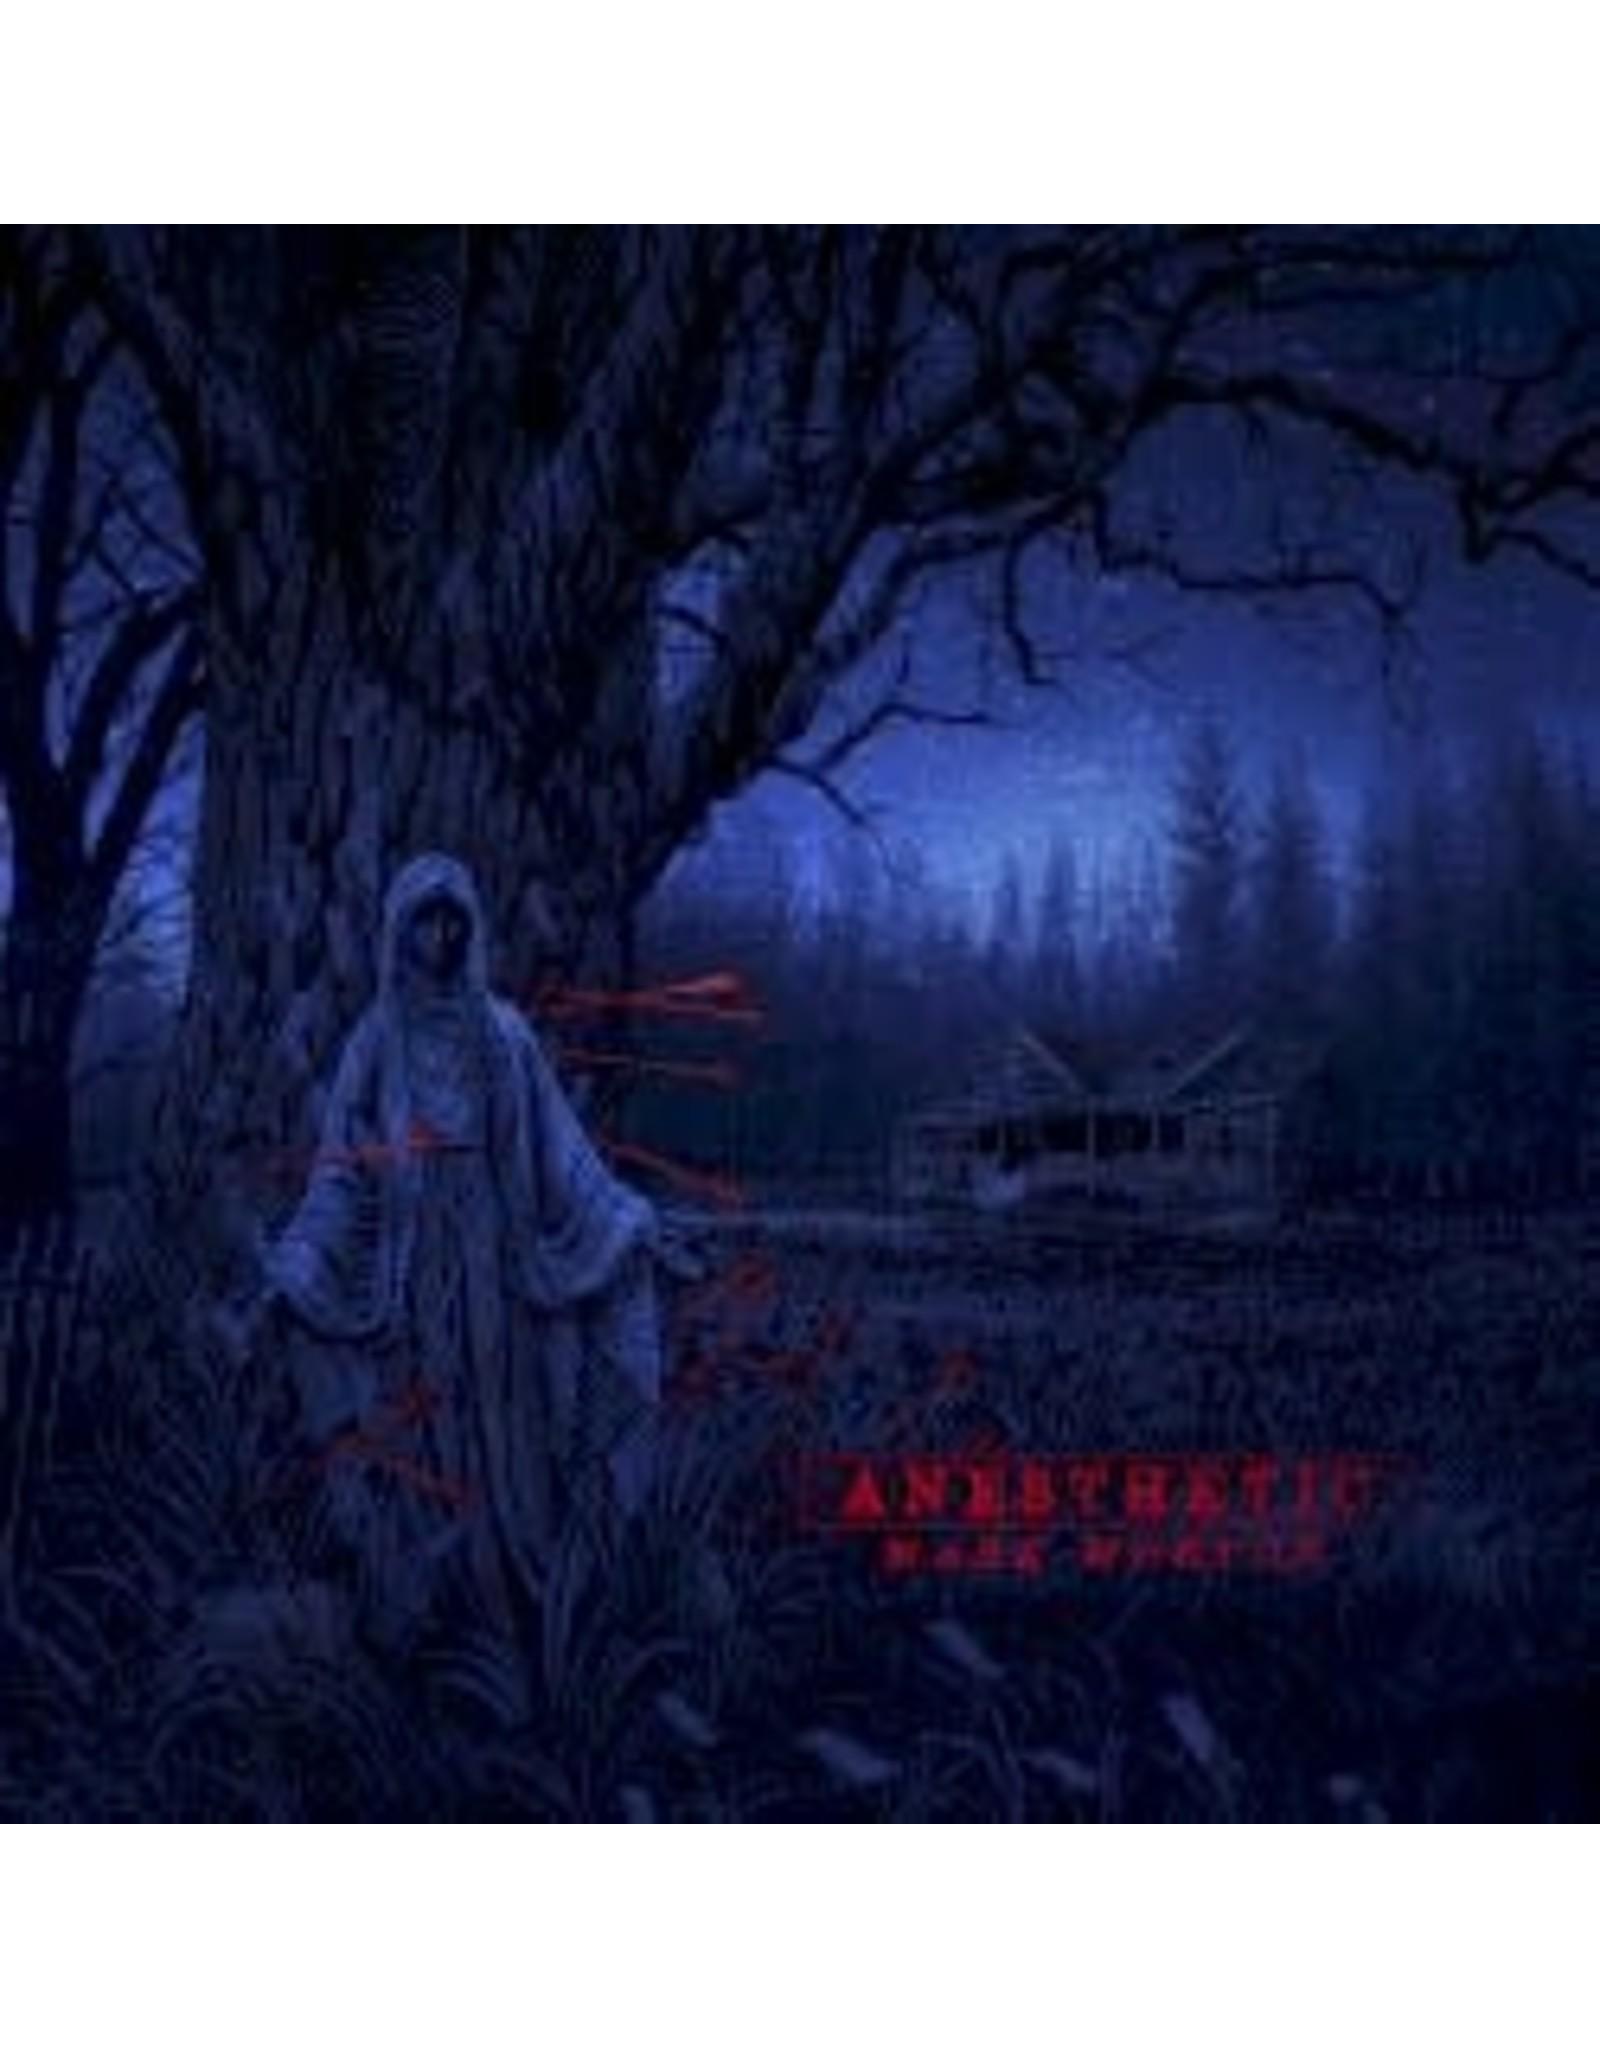 Morton,Mark - Anesthetic LP